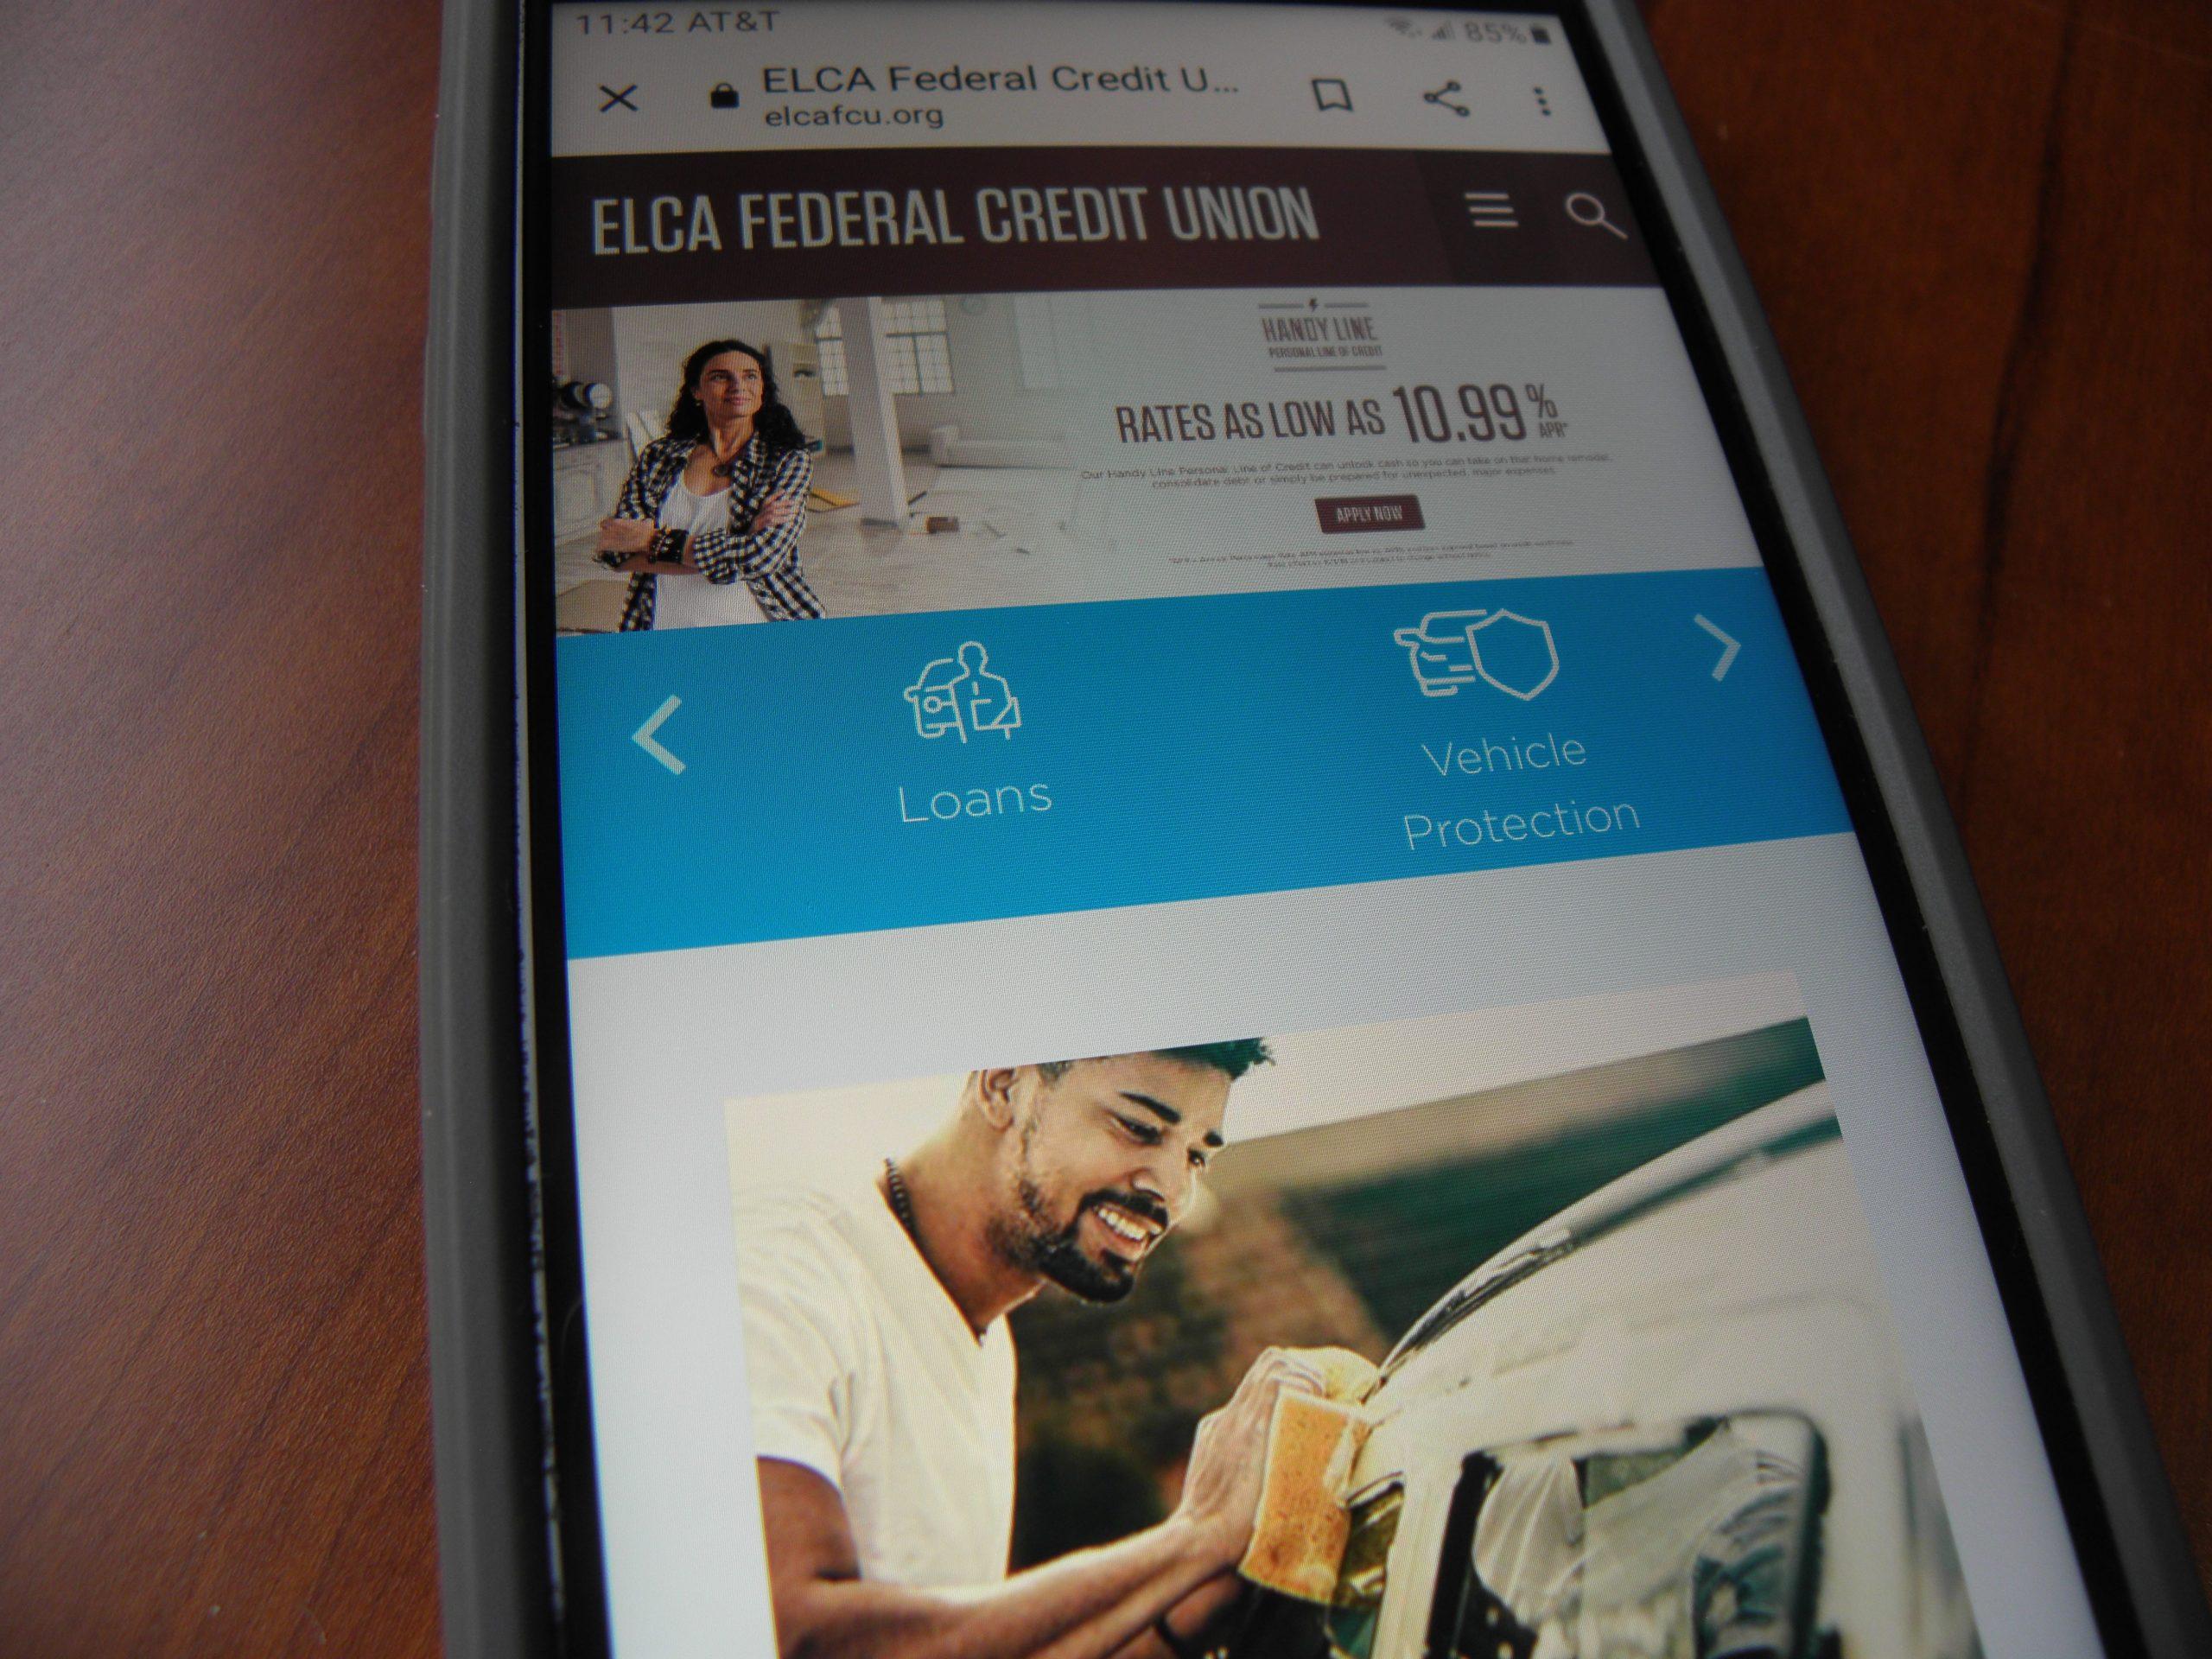 ELCA FCU screen shot on phone